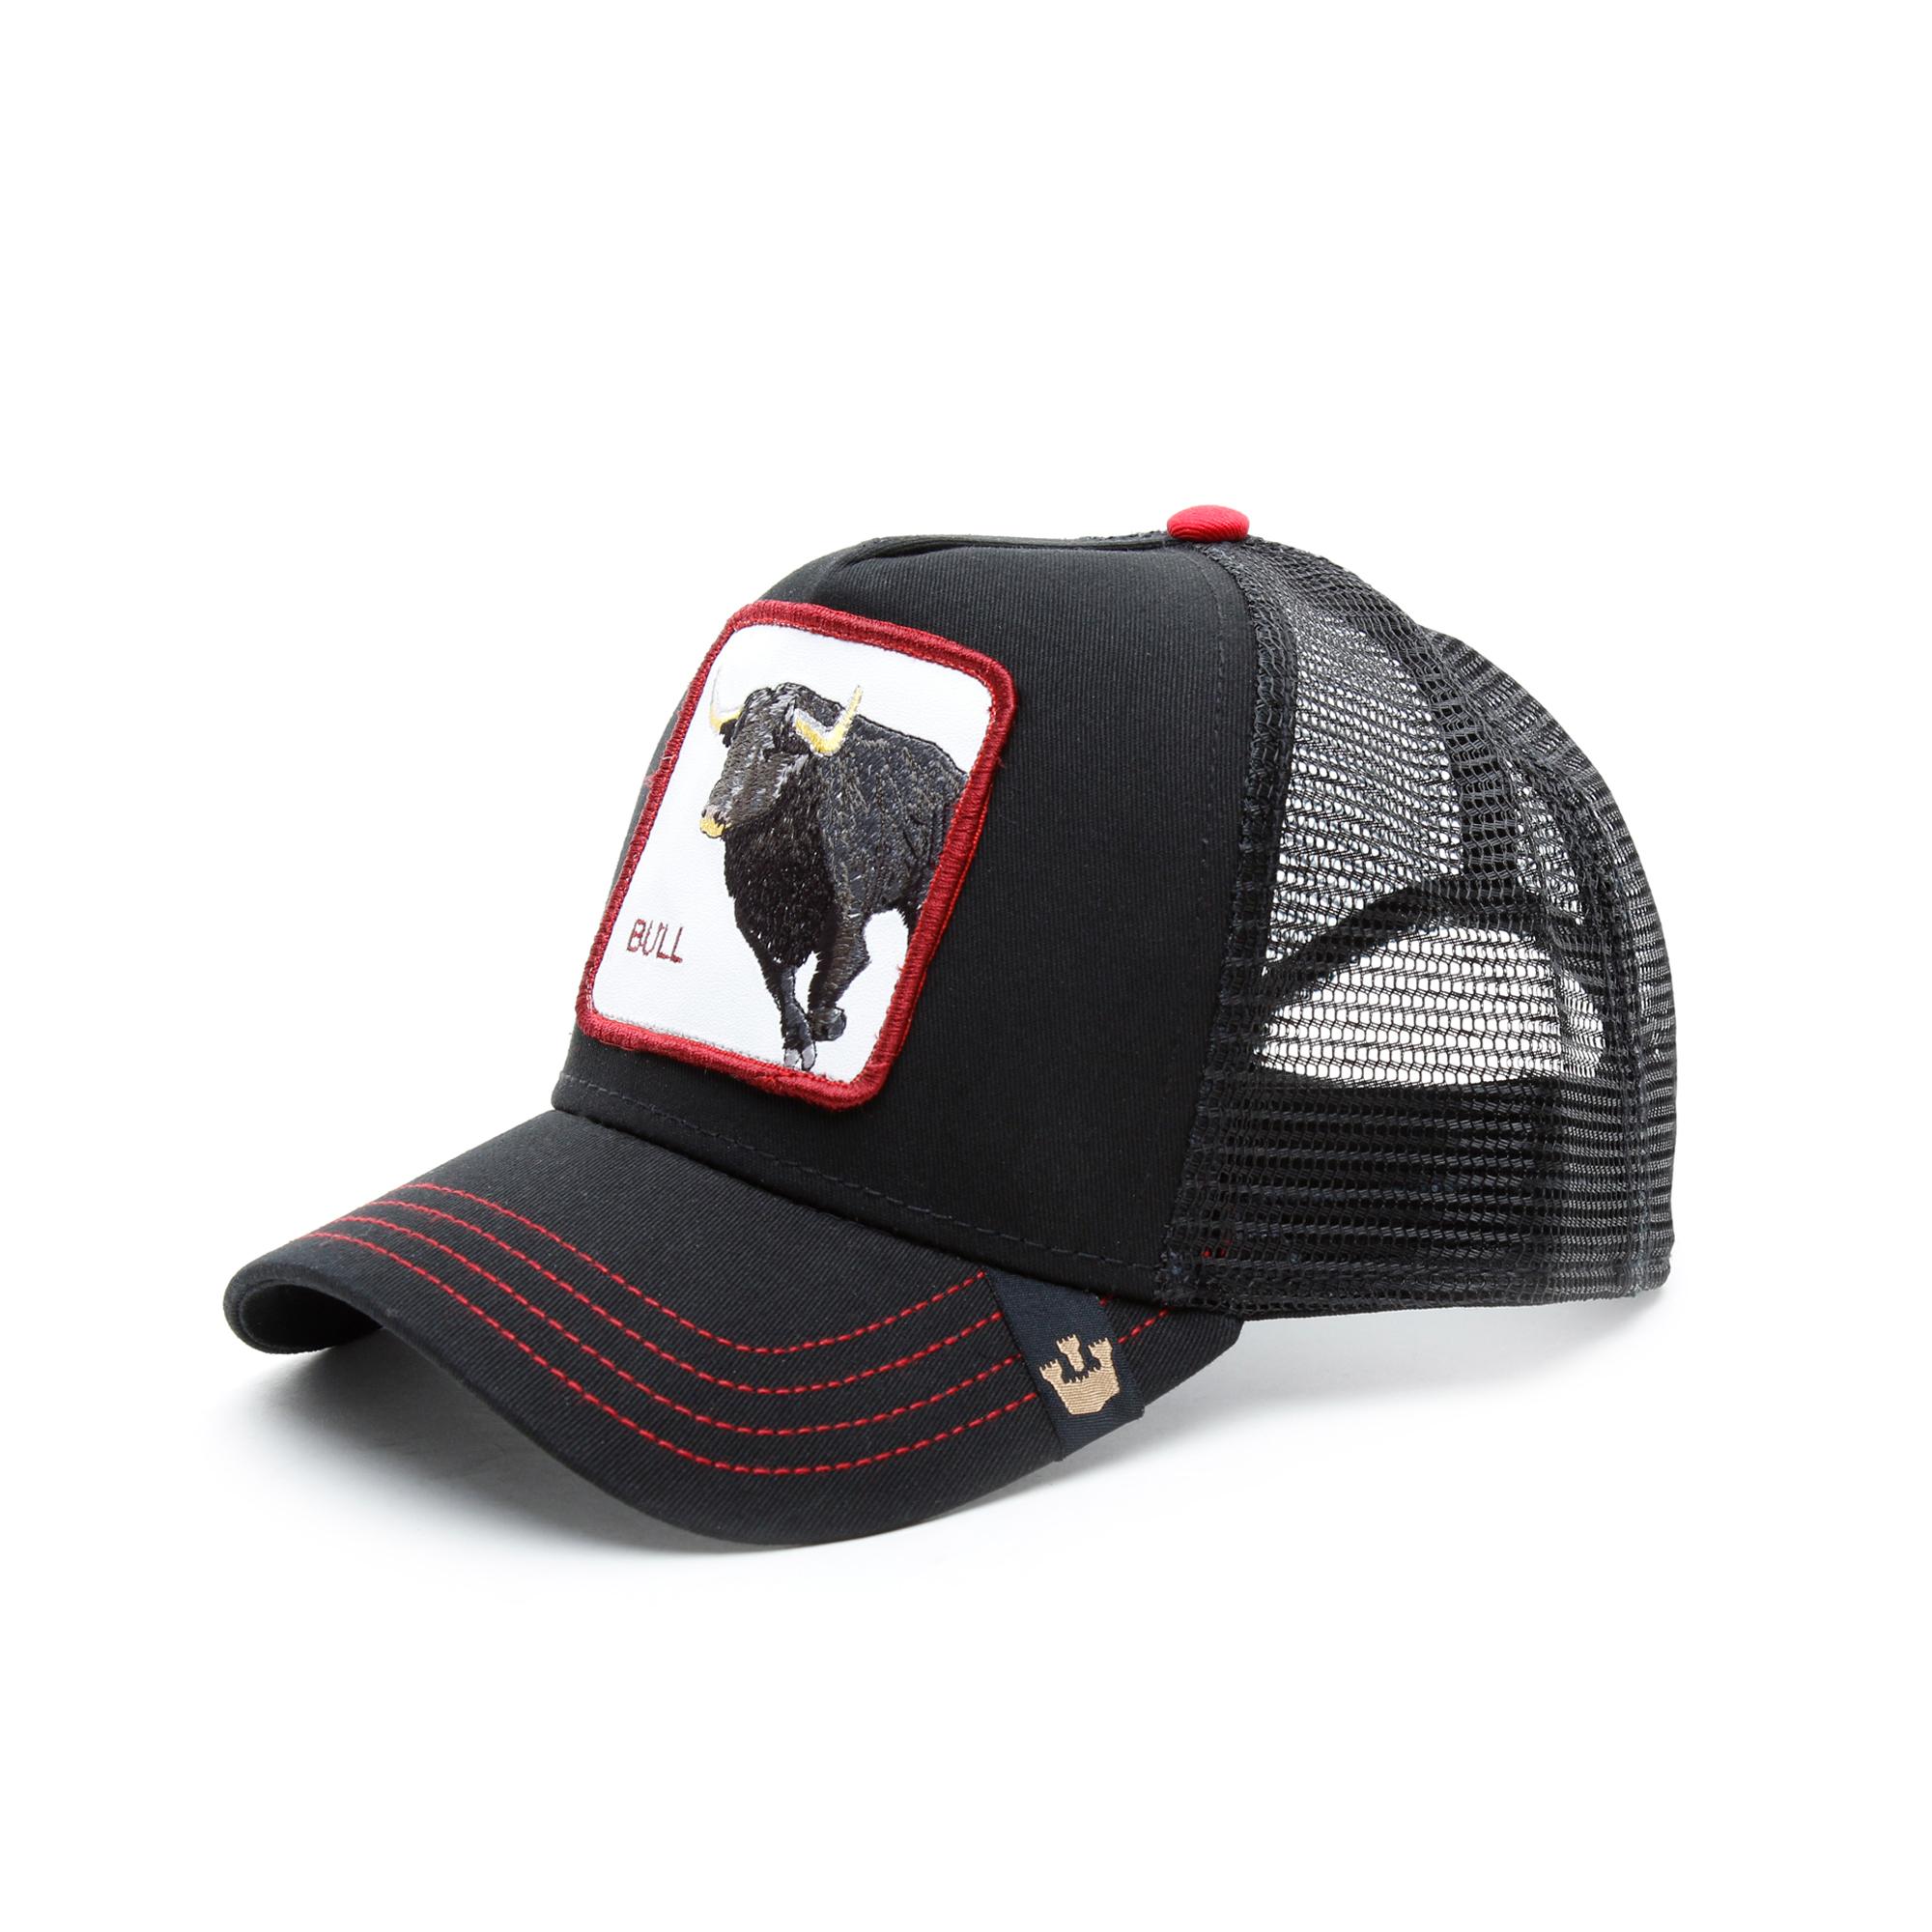 Goorin Bros Bull Honky Siyah Şapka